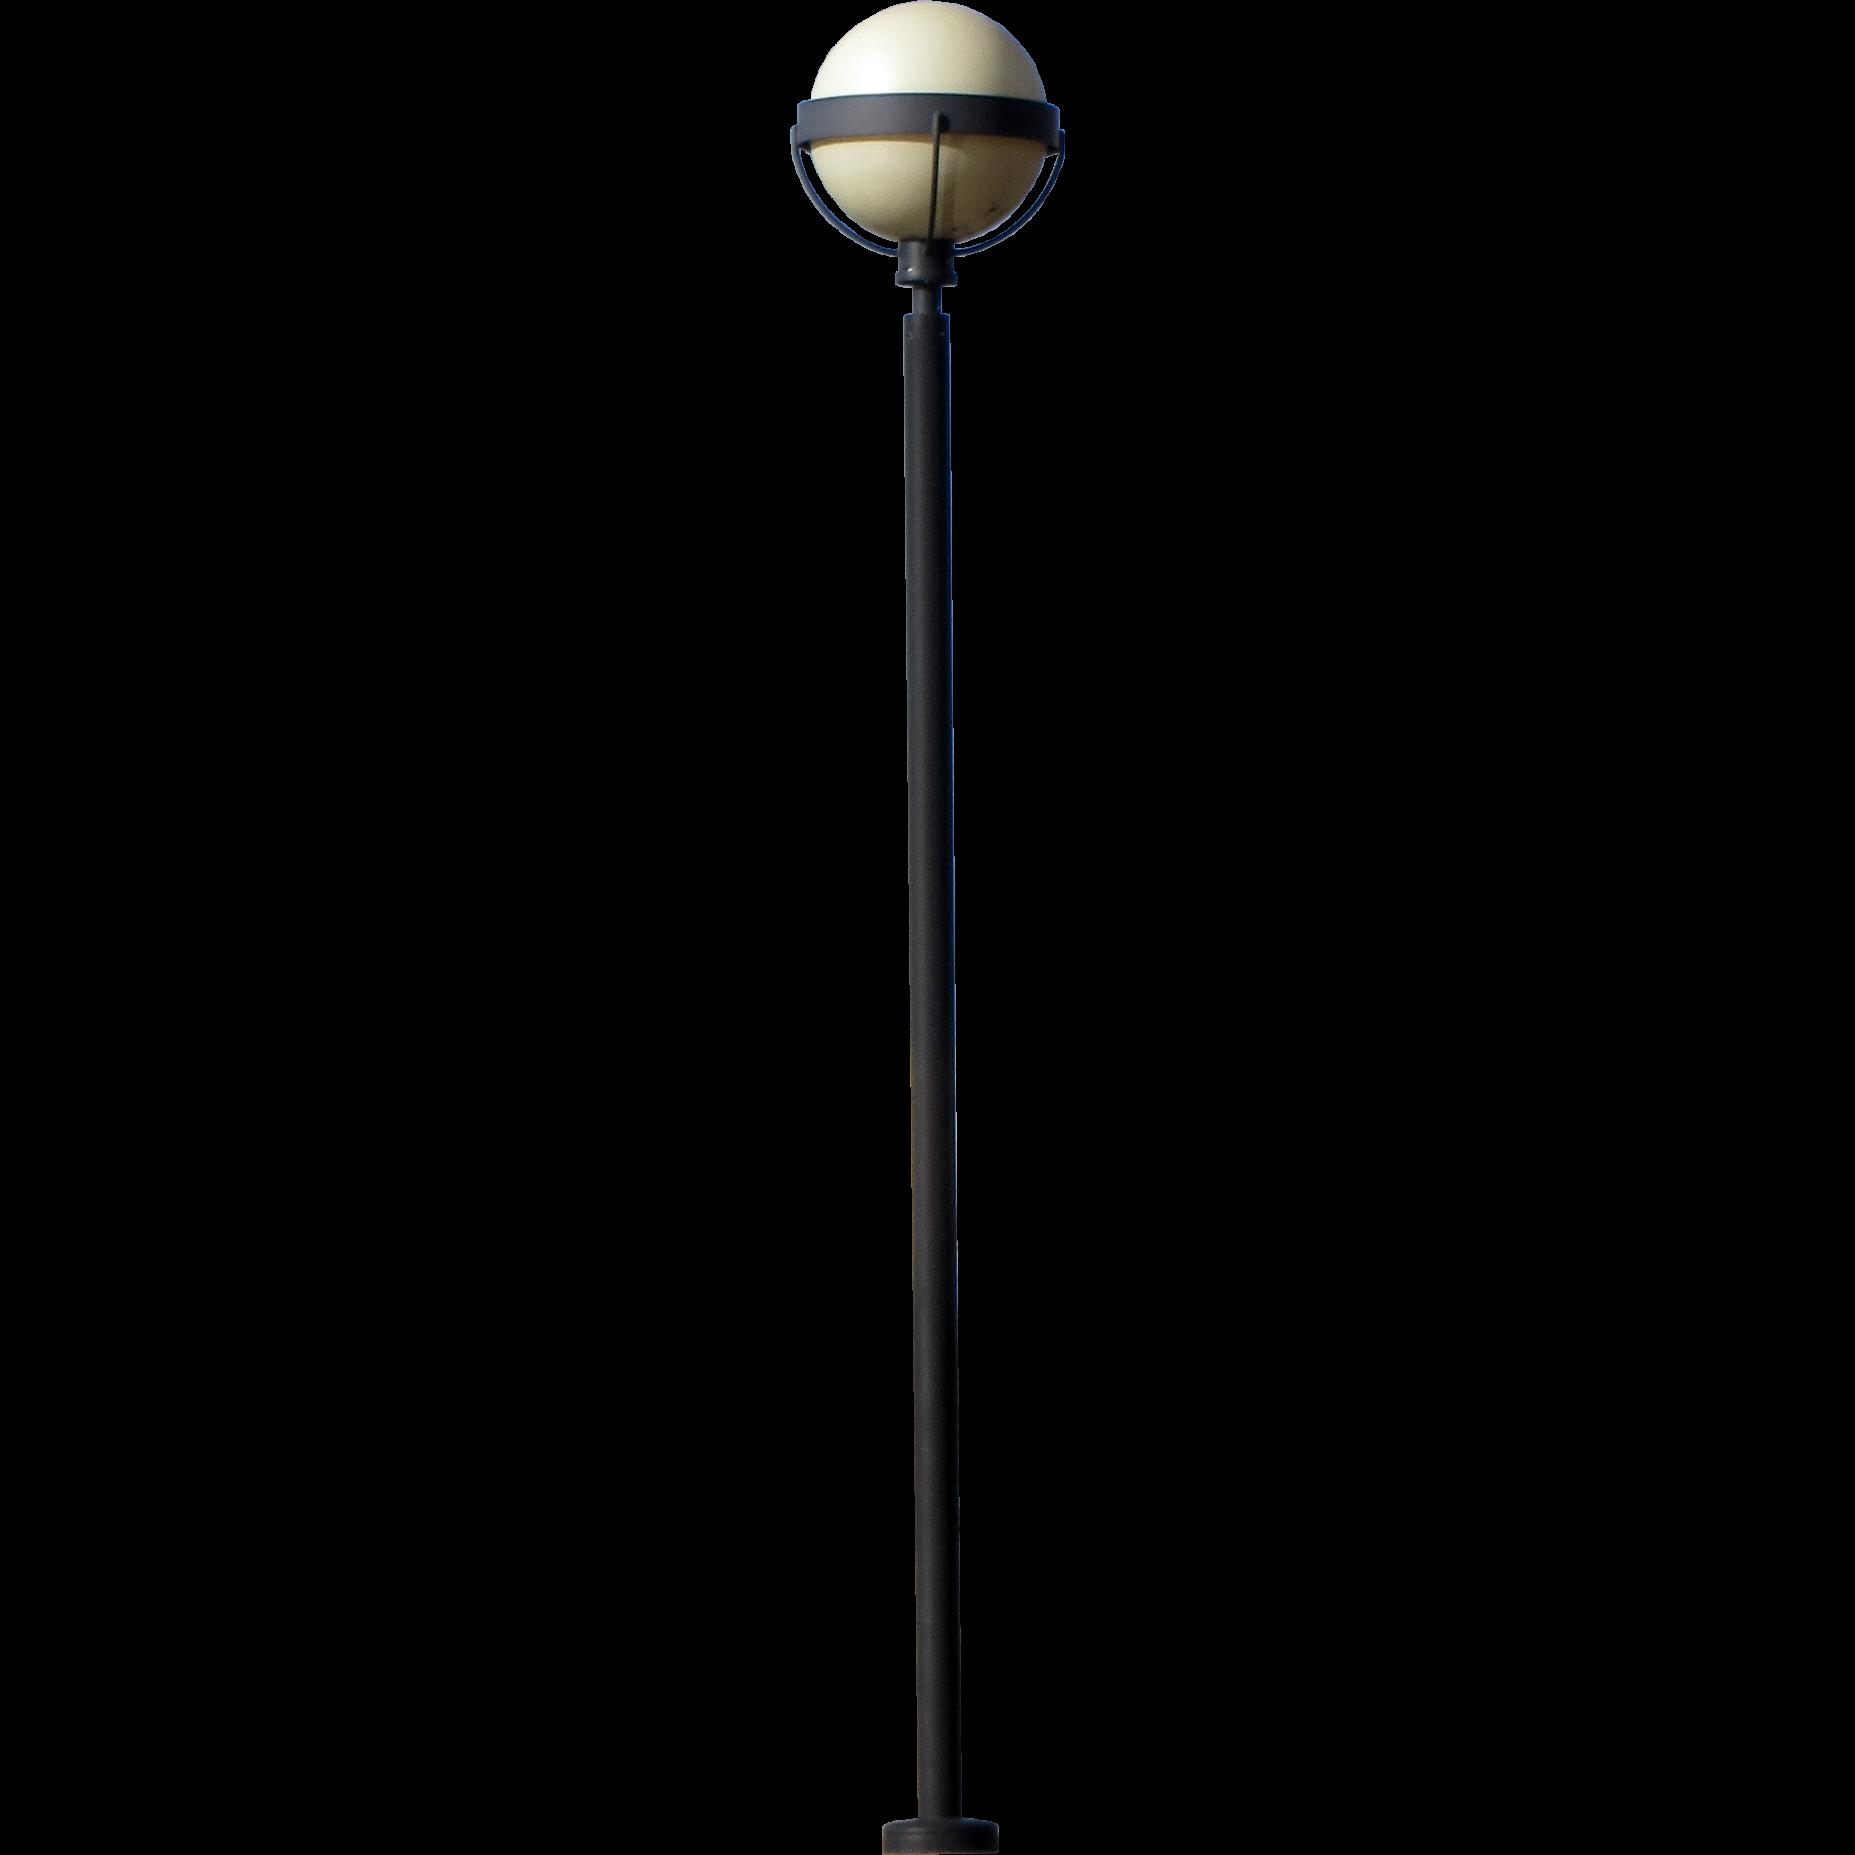 Download Street Light Photos HQ PNG Image | FreePNGImg for Road Lamp Png  126eri